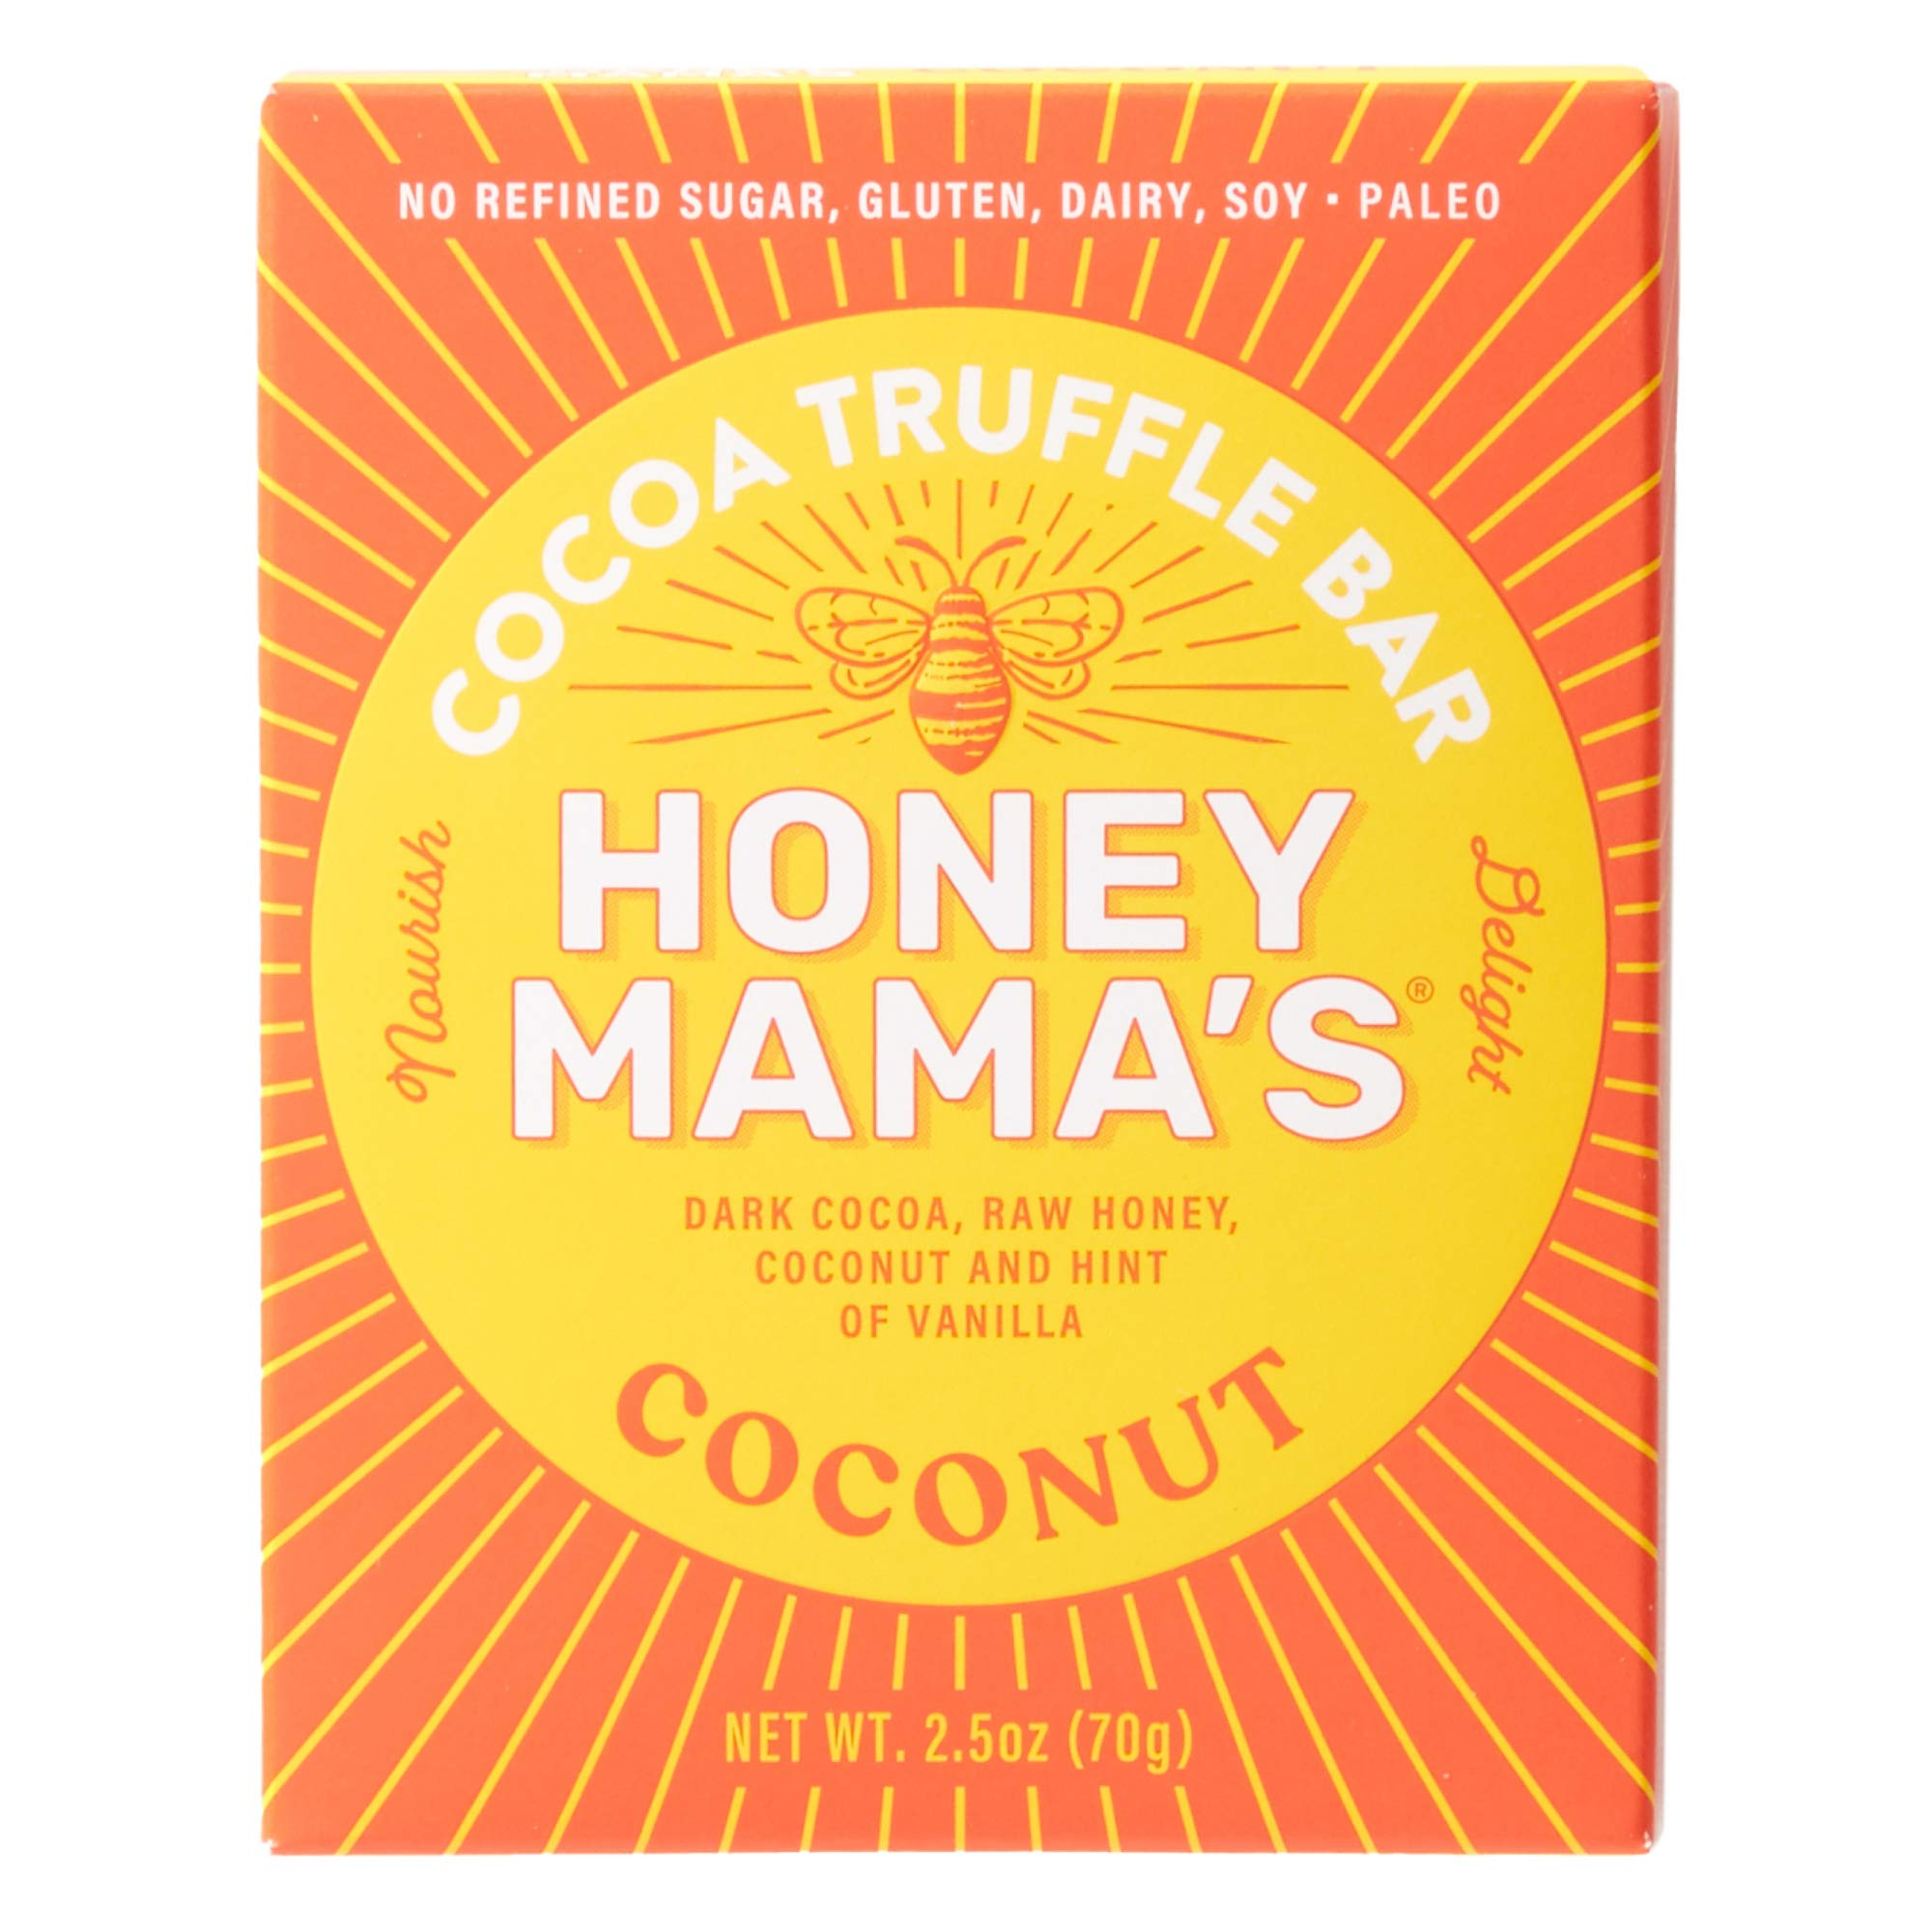 Honey Mama's Refrigerated Cocoa Truffle Bar, Coconut Bar, 2.5 oz (Pack of 12)